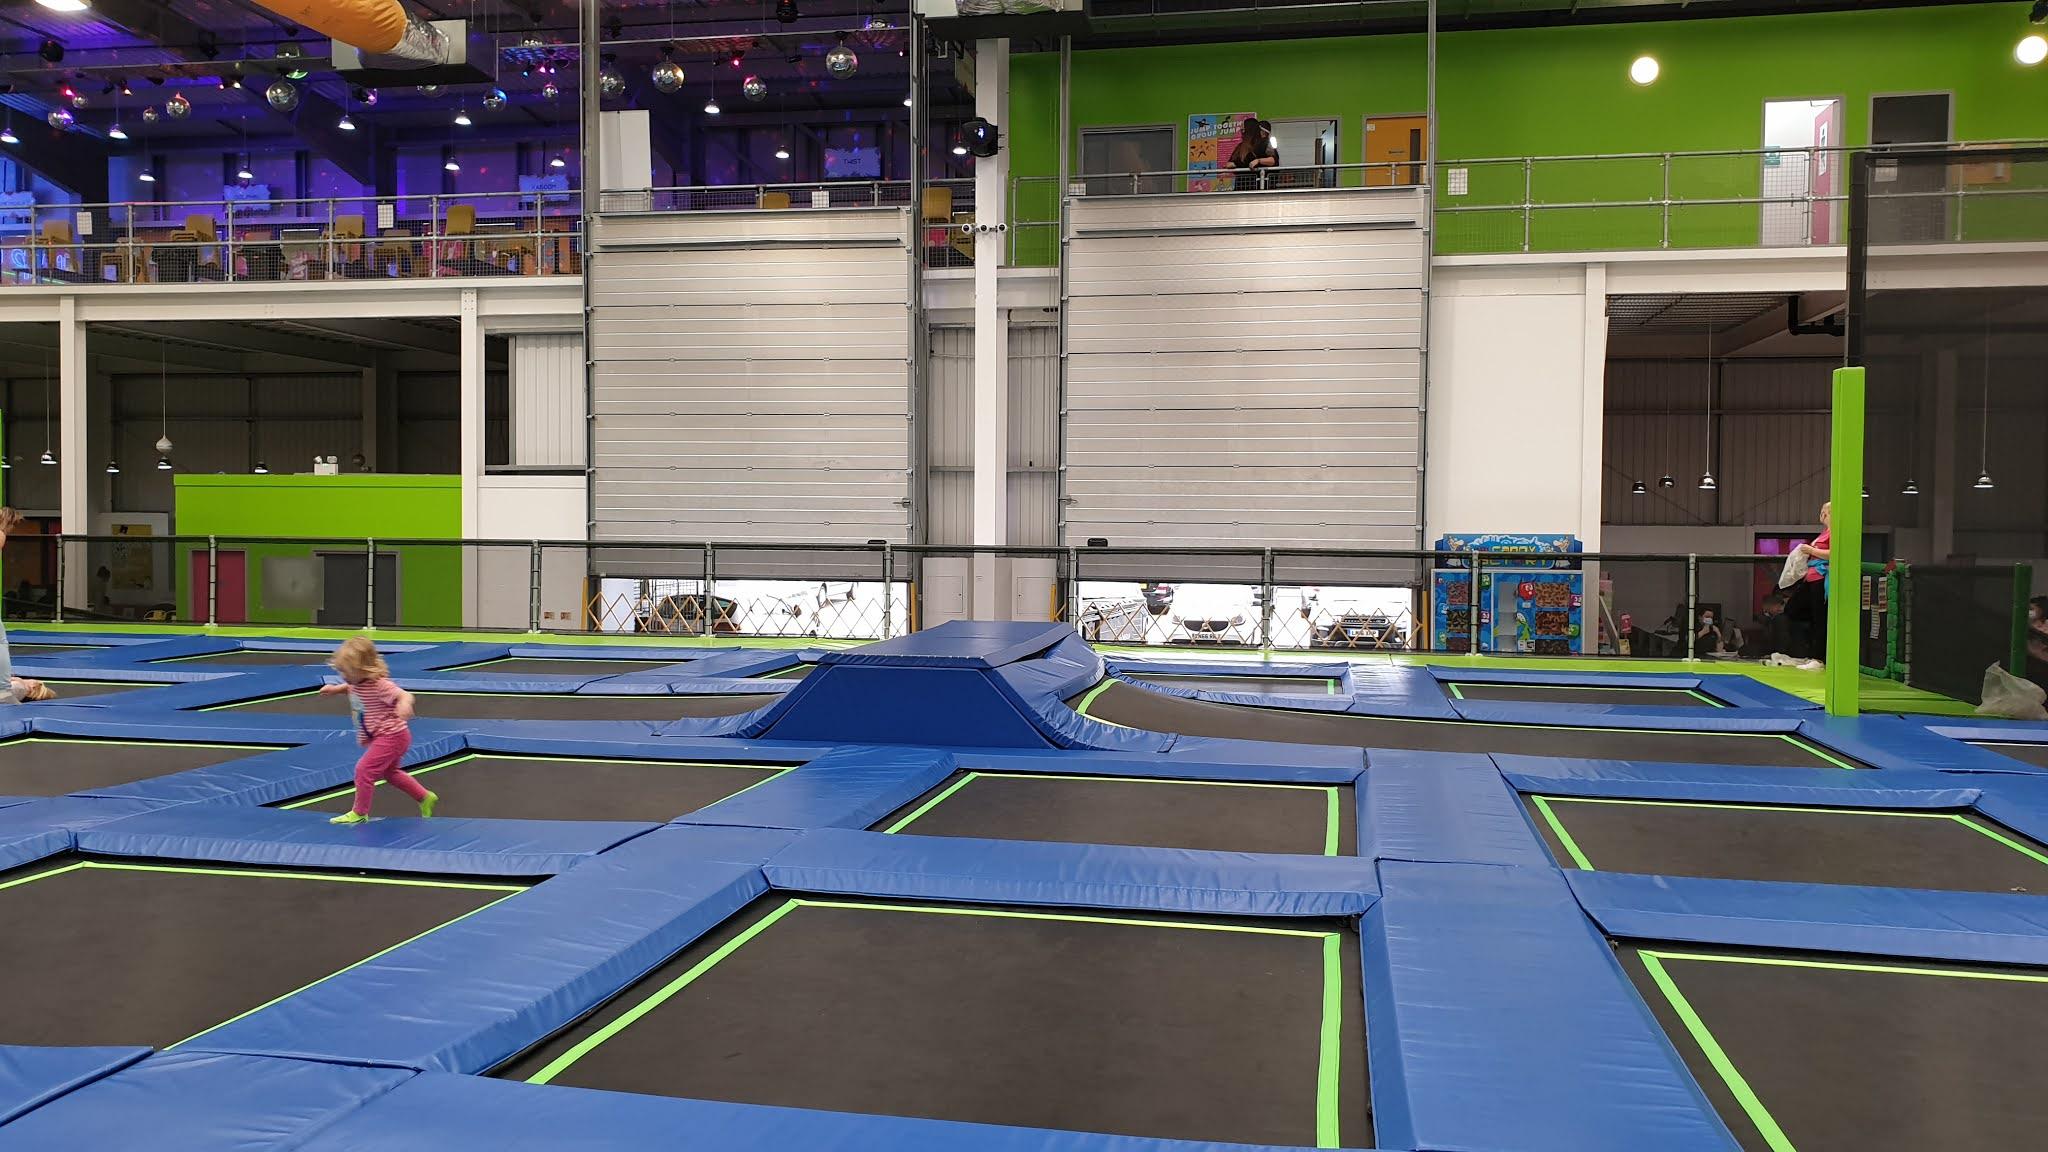 jump in trampoline area